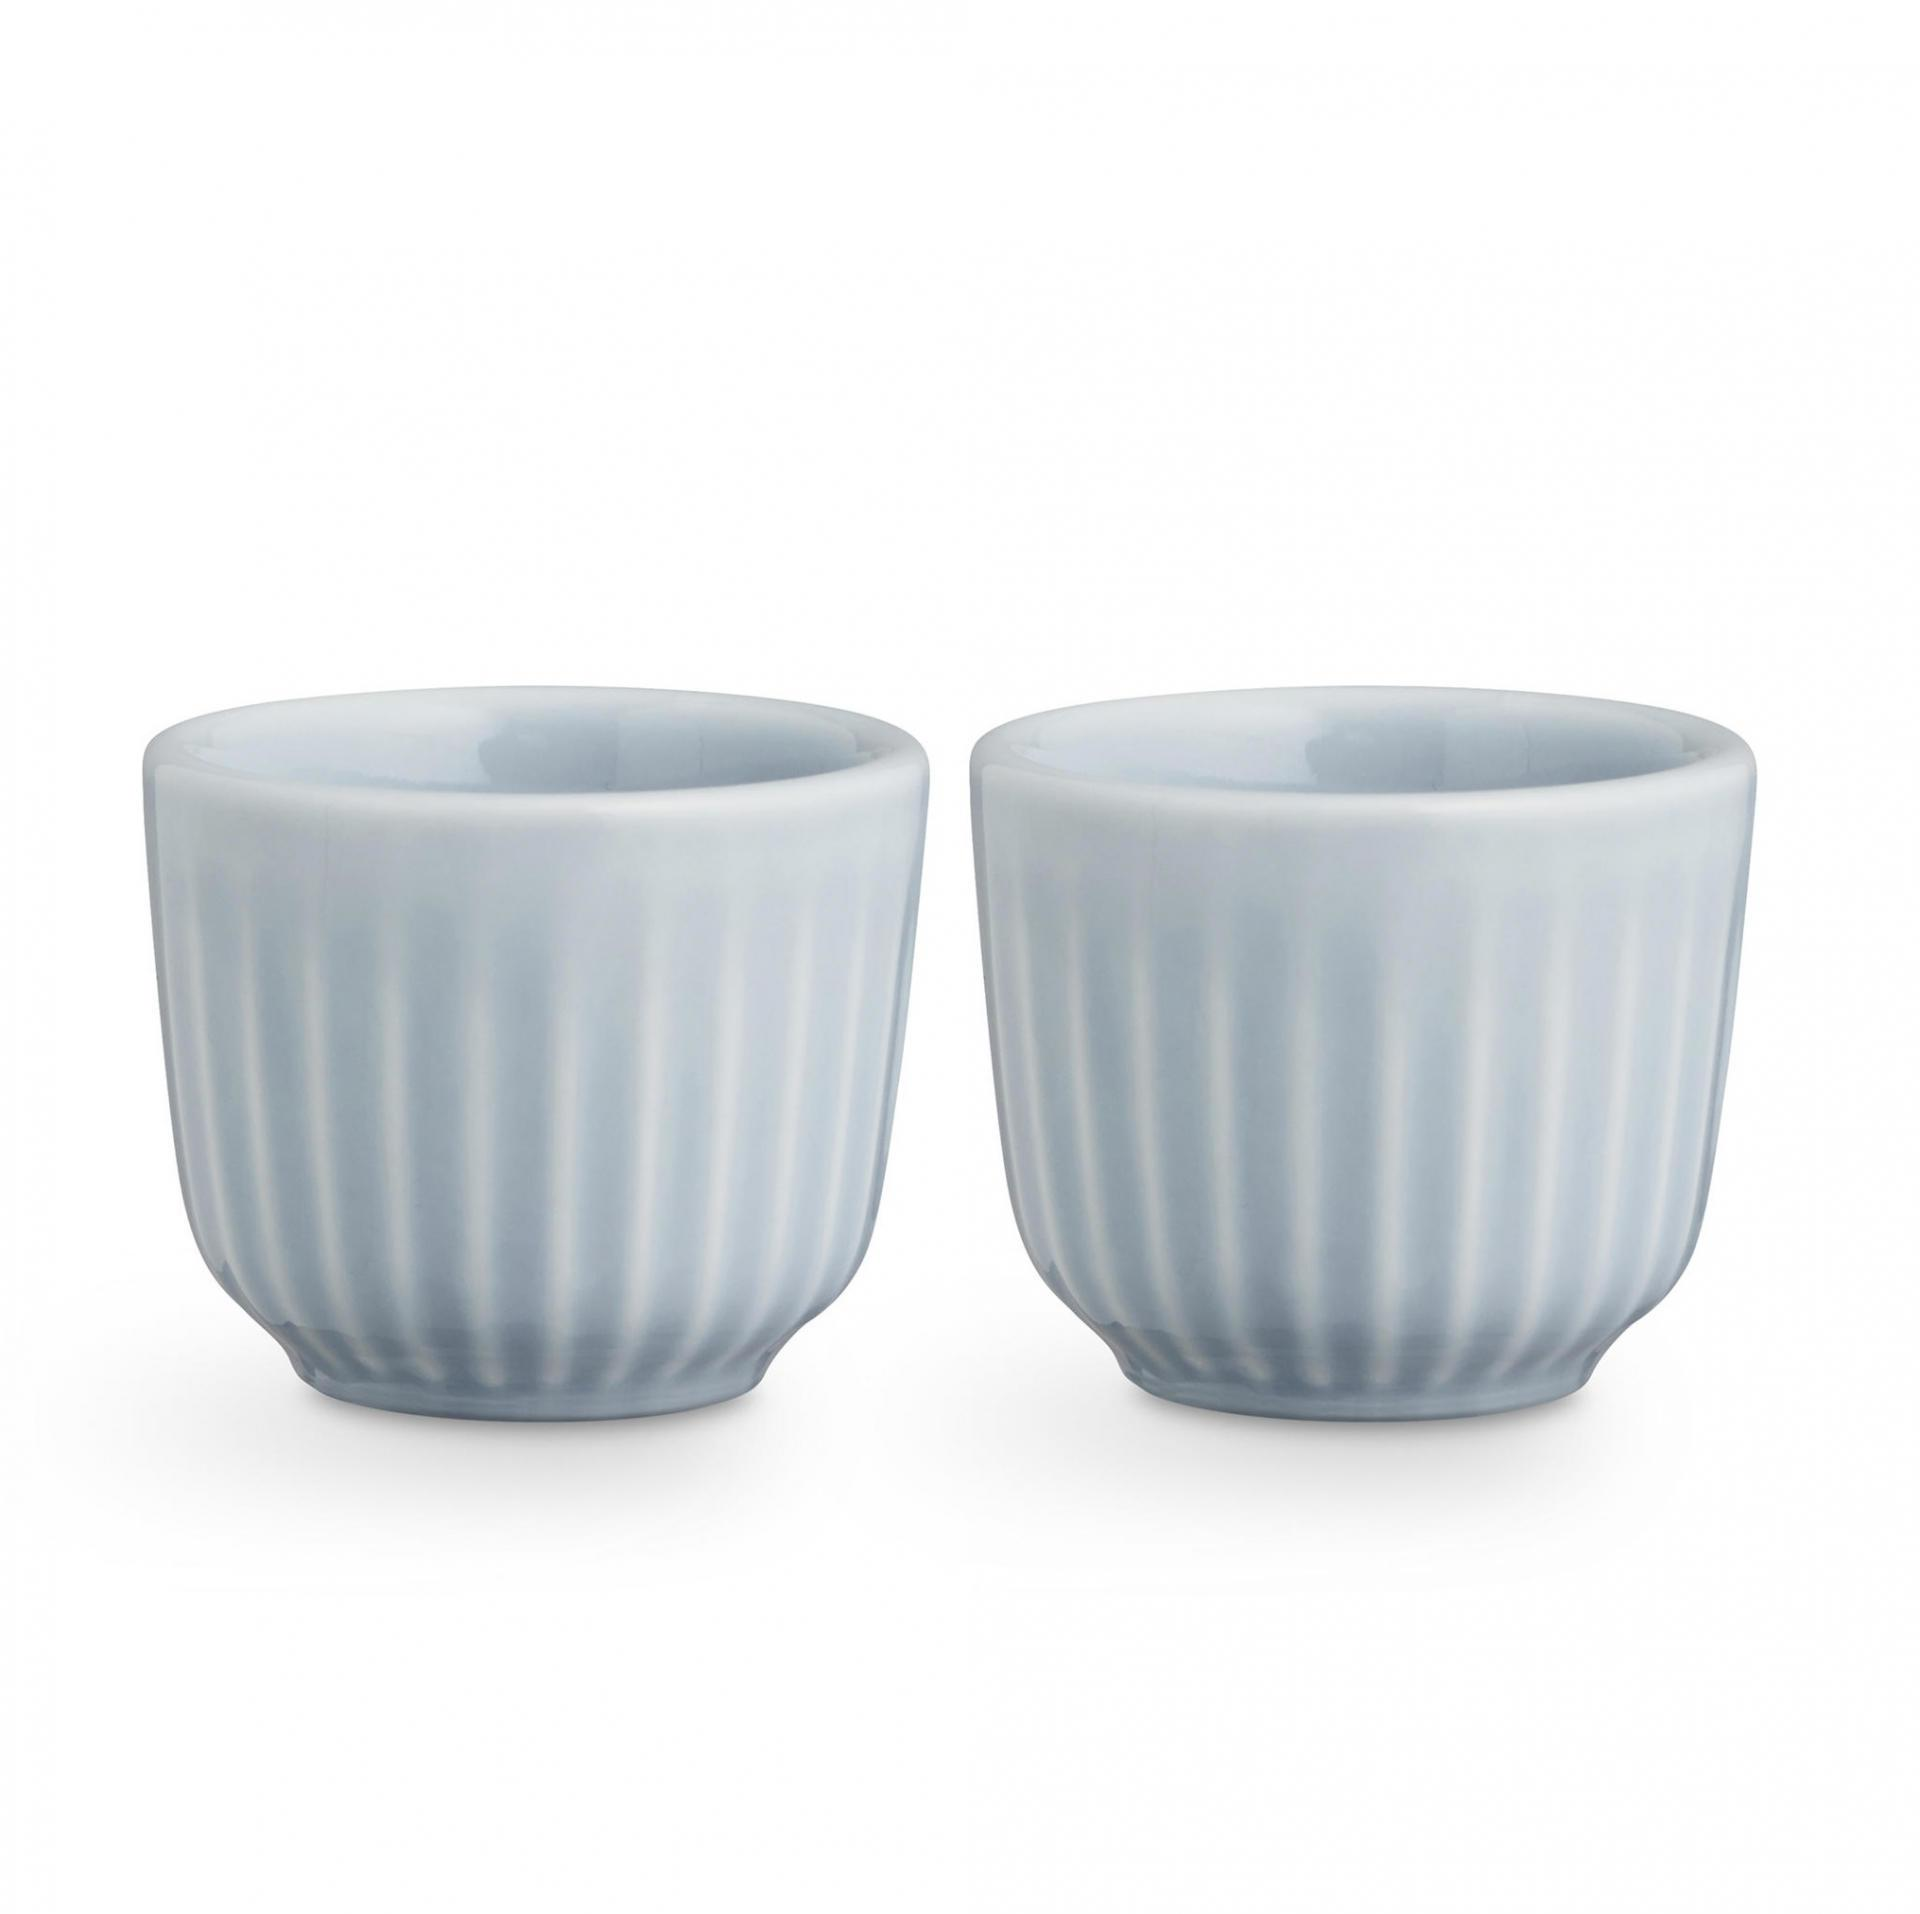 KÄHLER Stojánek na vajíčko Hammershøi Sky - set 2 ks, modrá barva, keramika